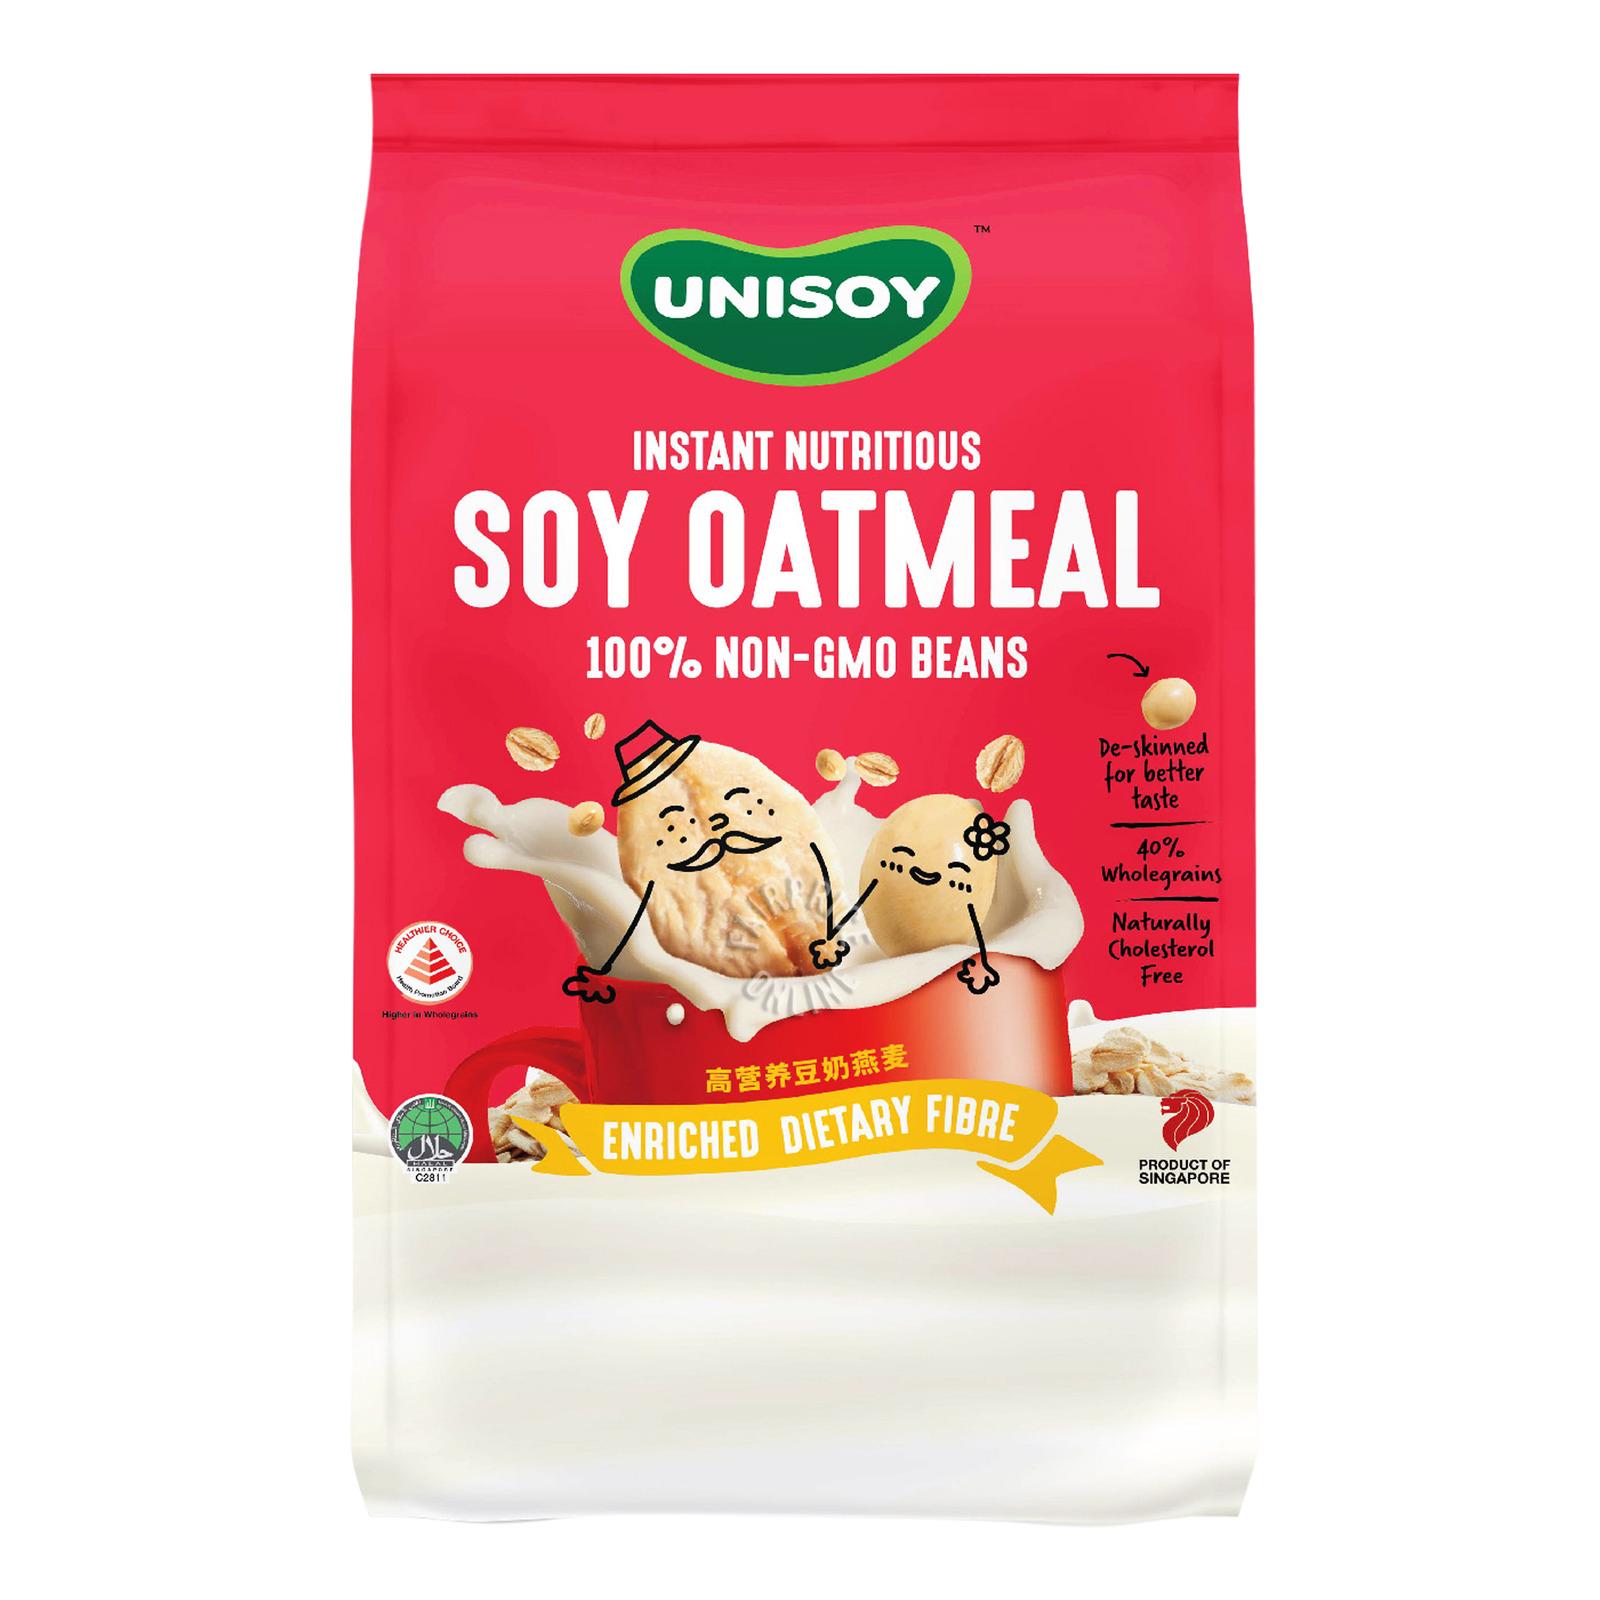 Unisoy Instant Nutritious Soya Oatmeal